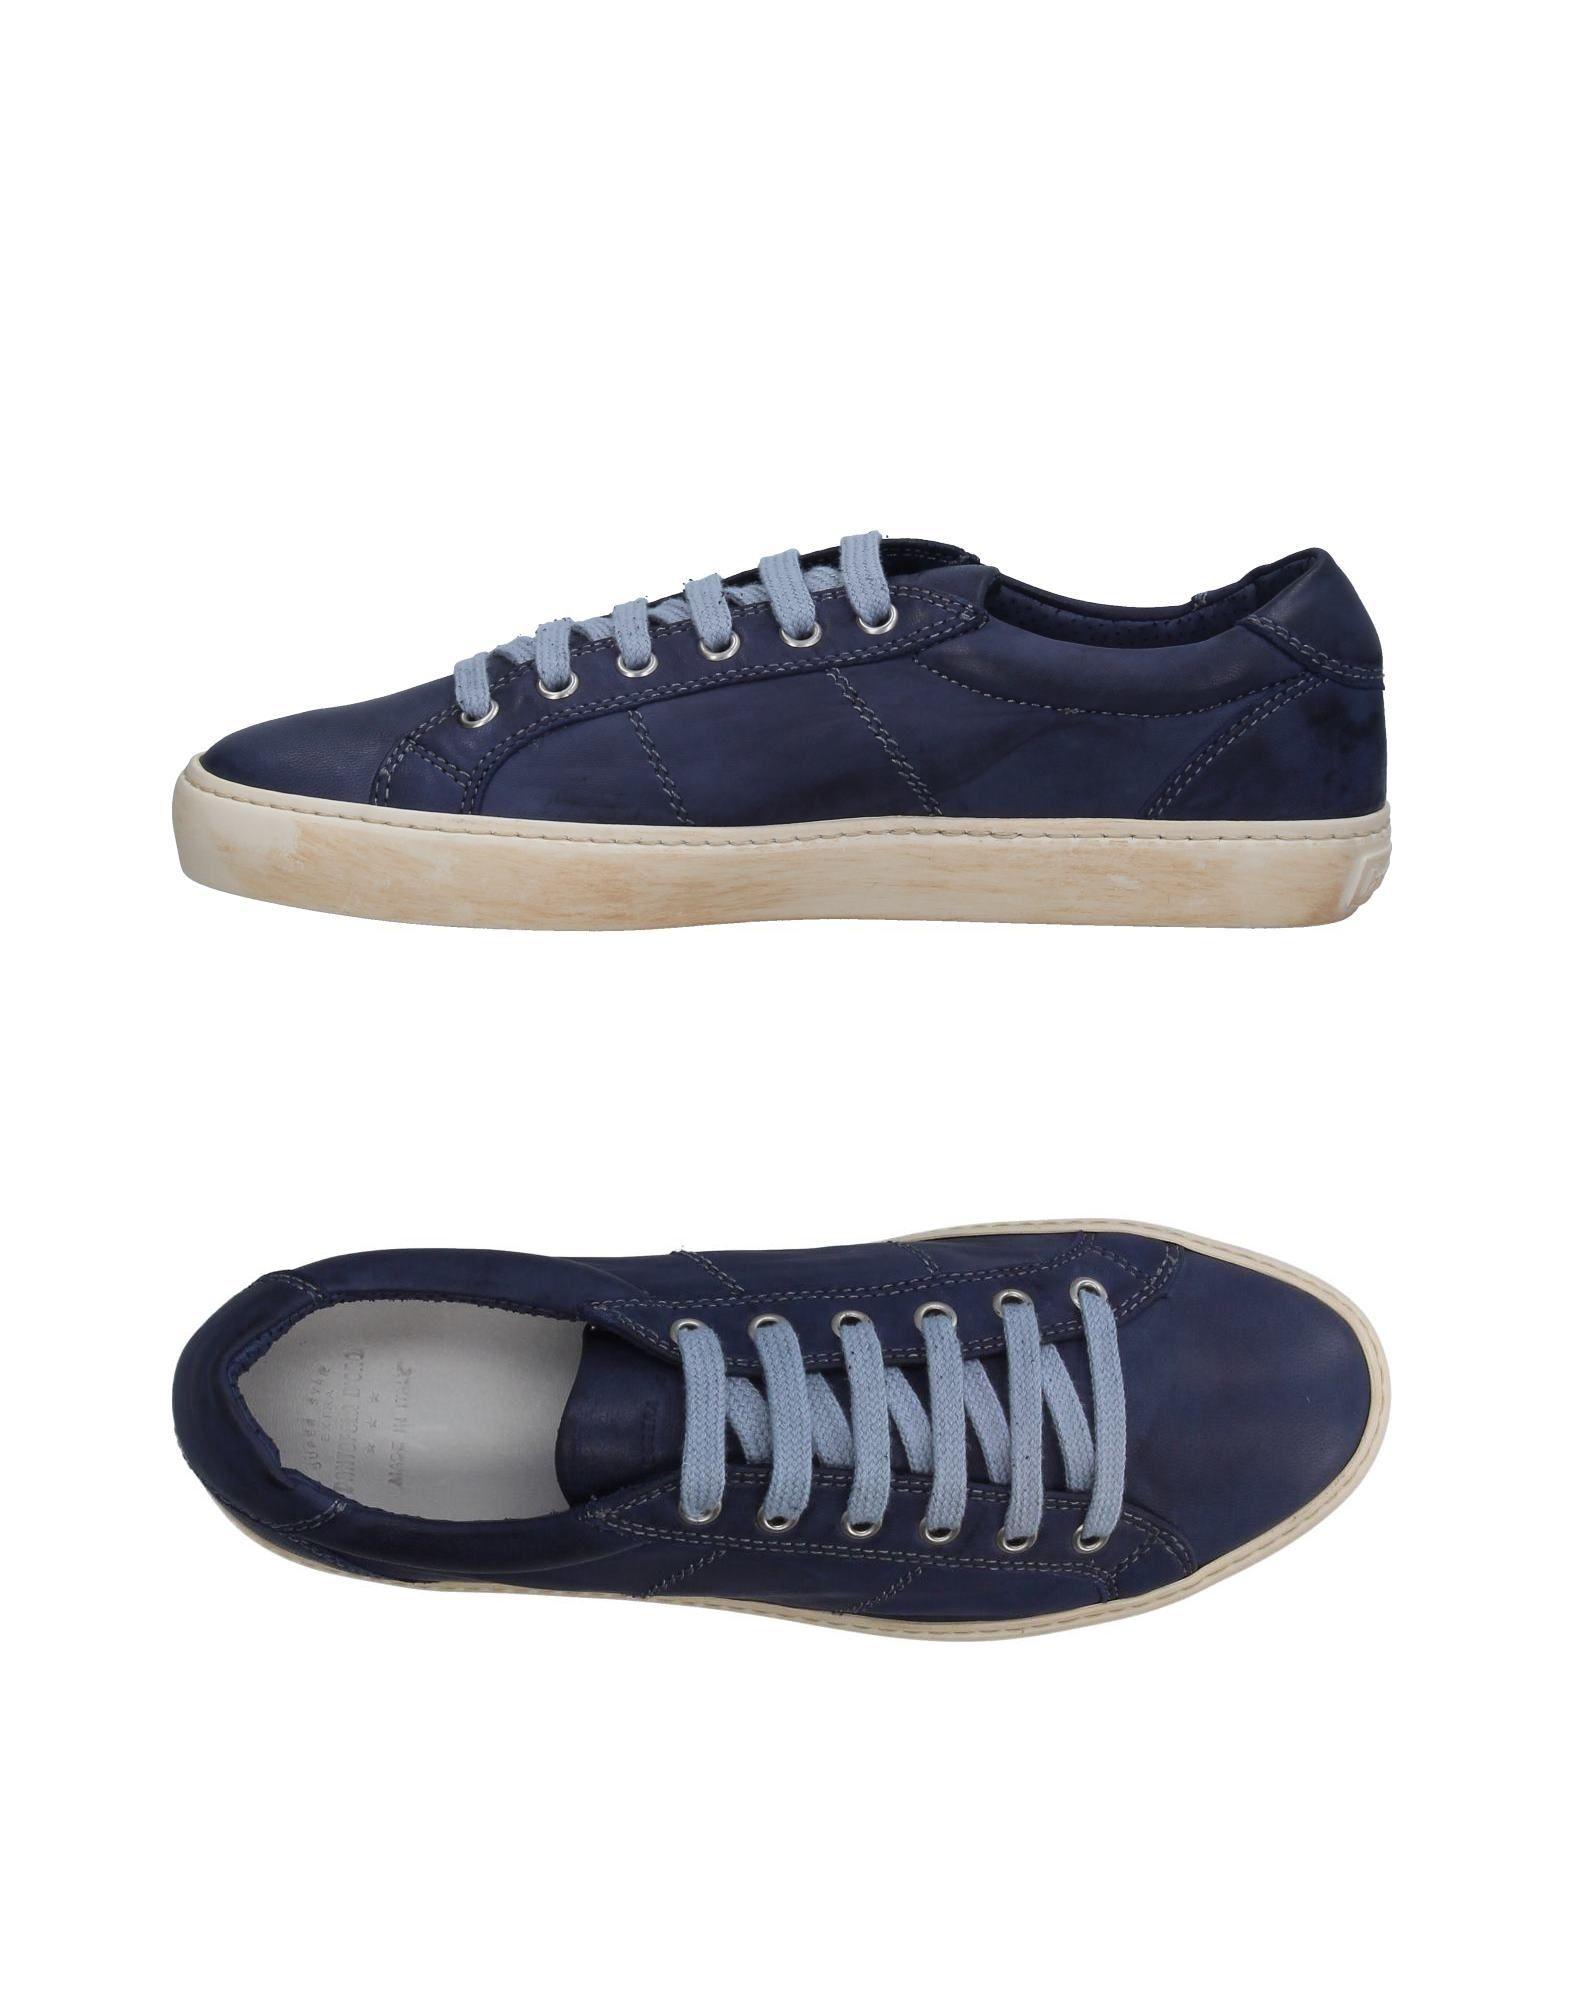 Pantofola D'oro Sneakers Damen  11339683EX Gute Qualität beliebte Schuhe